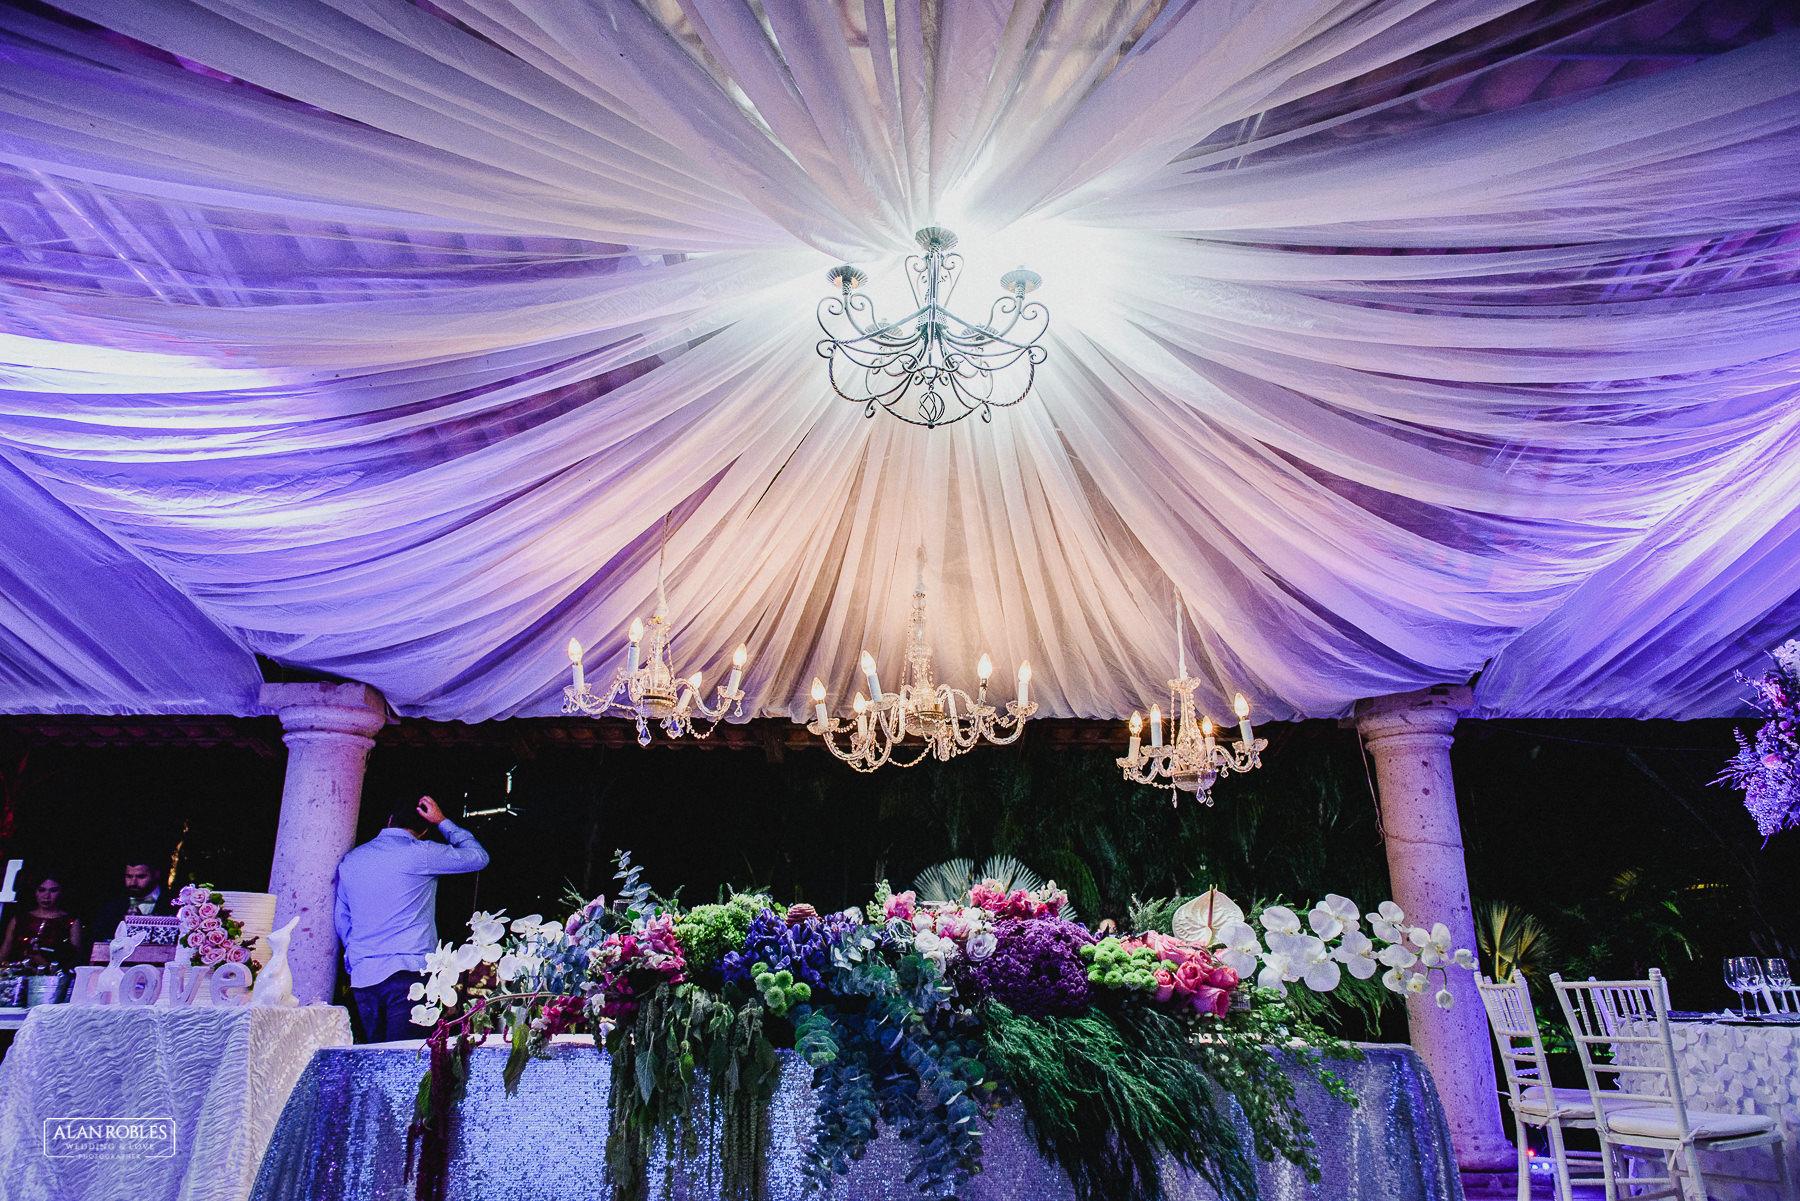 Alan Robles fotografo de bodas guadalajara - LyP Hotel Demetria-62